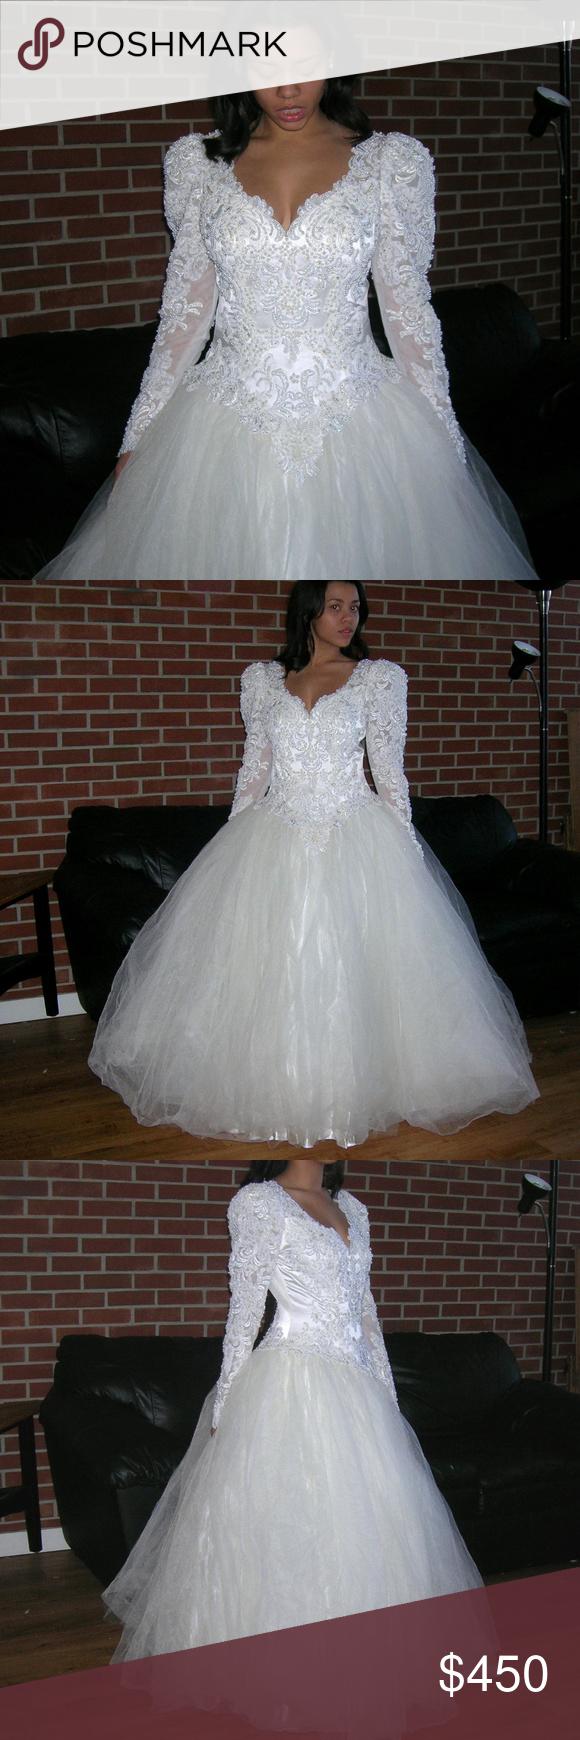 Cinderella inspired wedding dress  GINZA Beaded Sequin Satin Lace Wedding Dress Gown  My Posh Closet